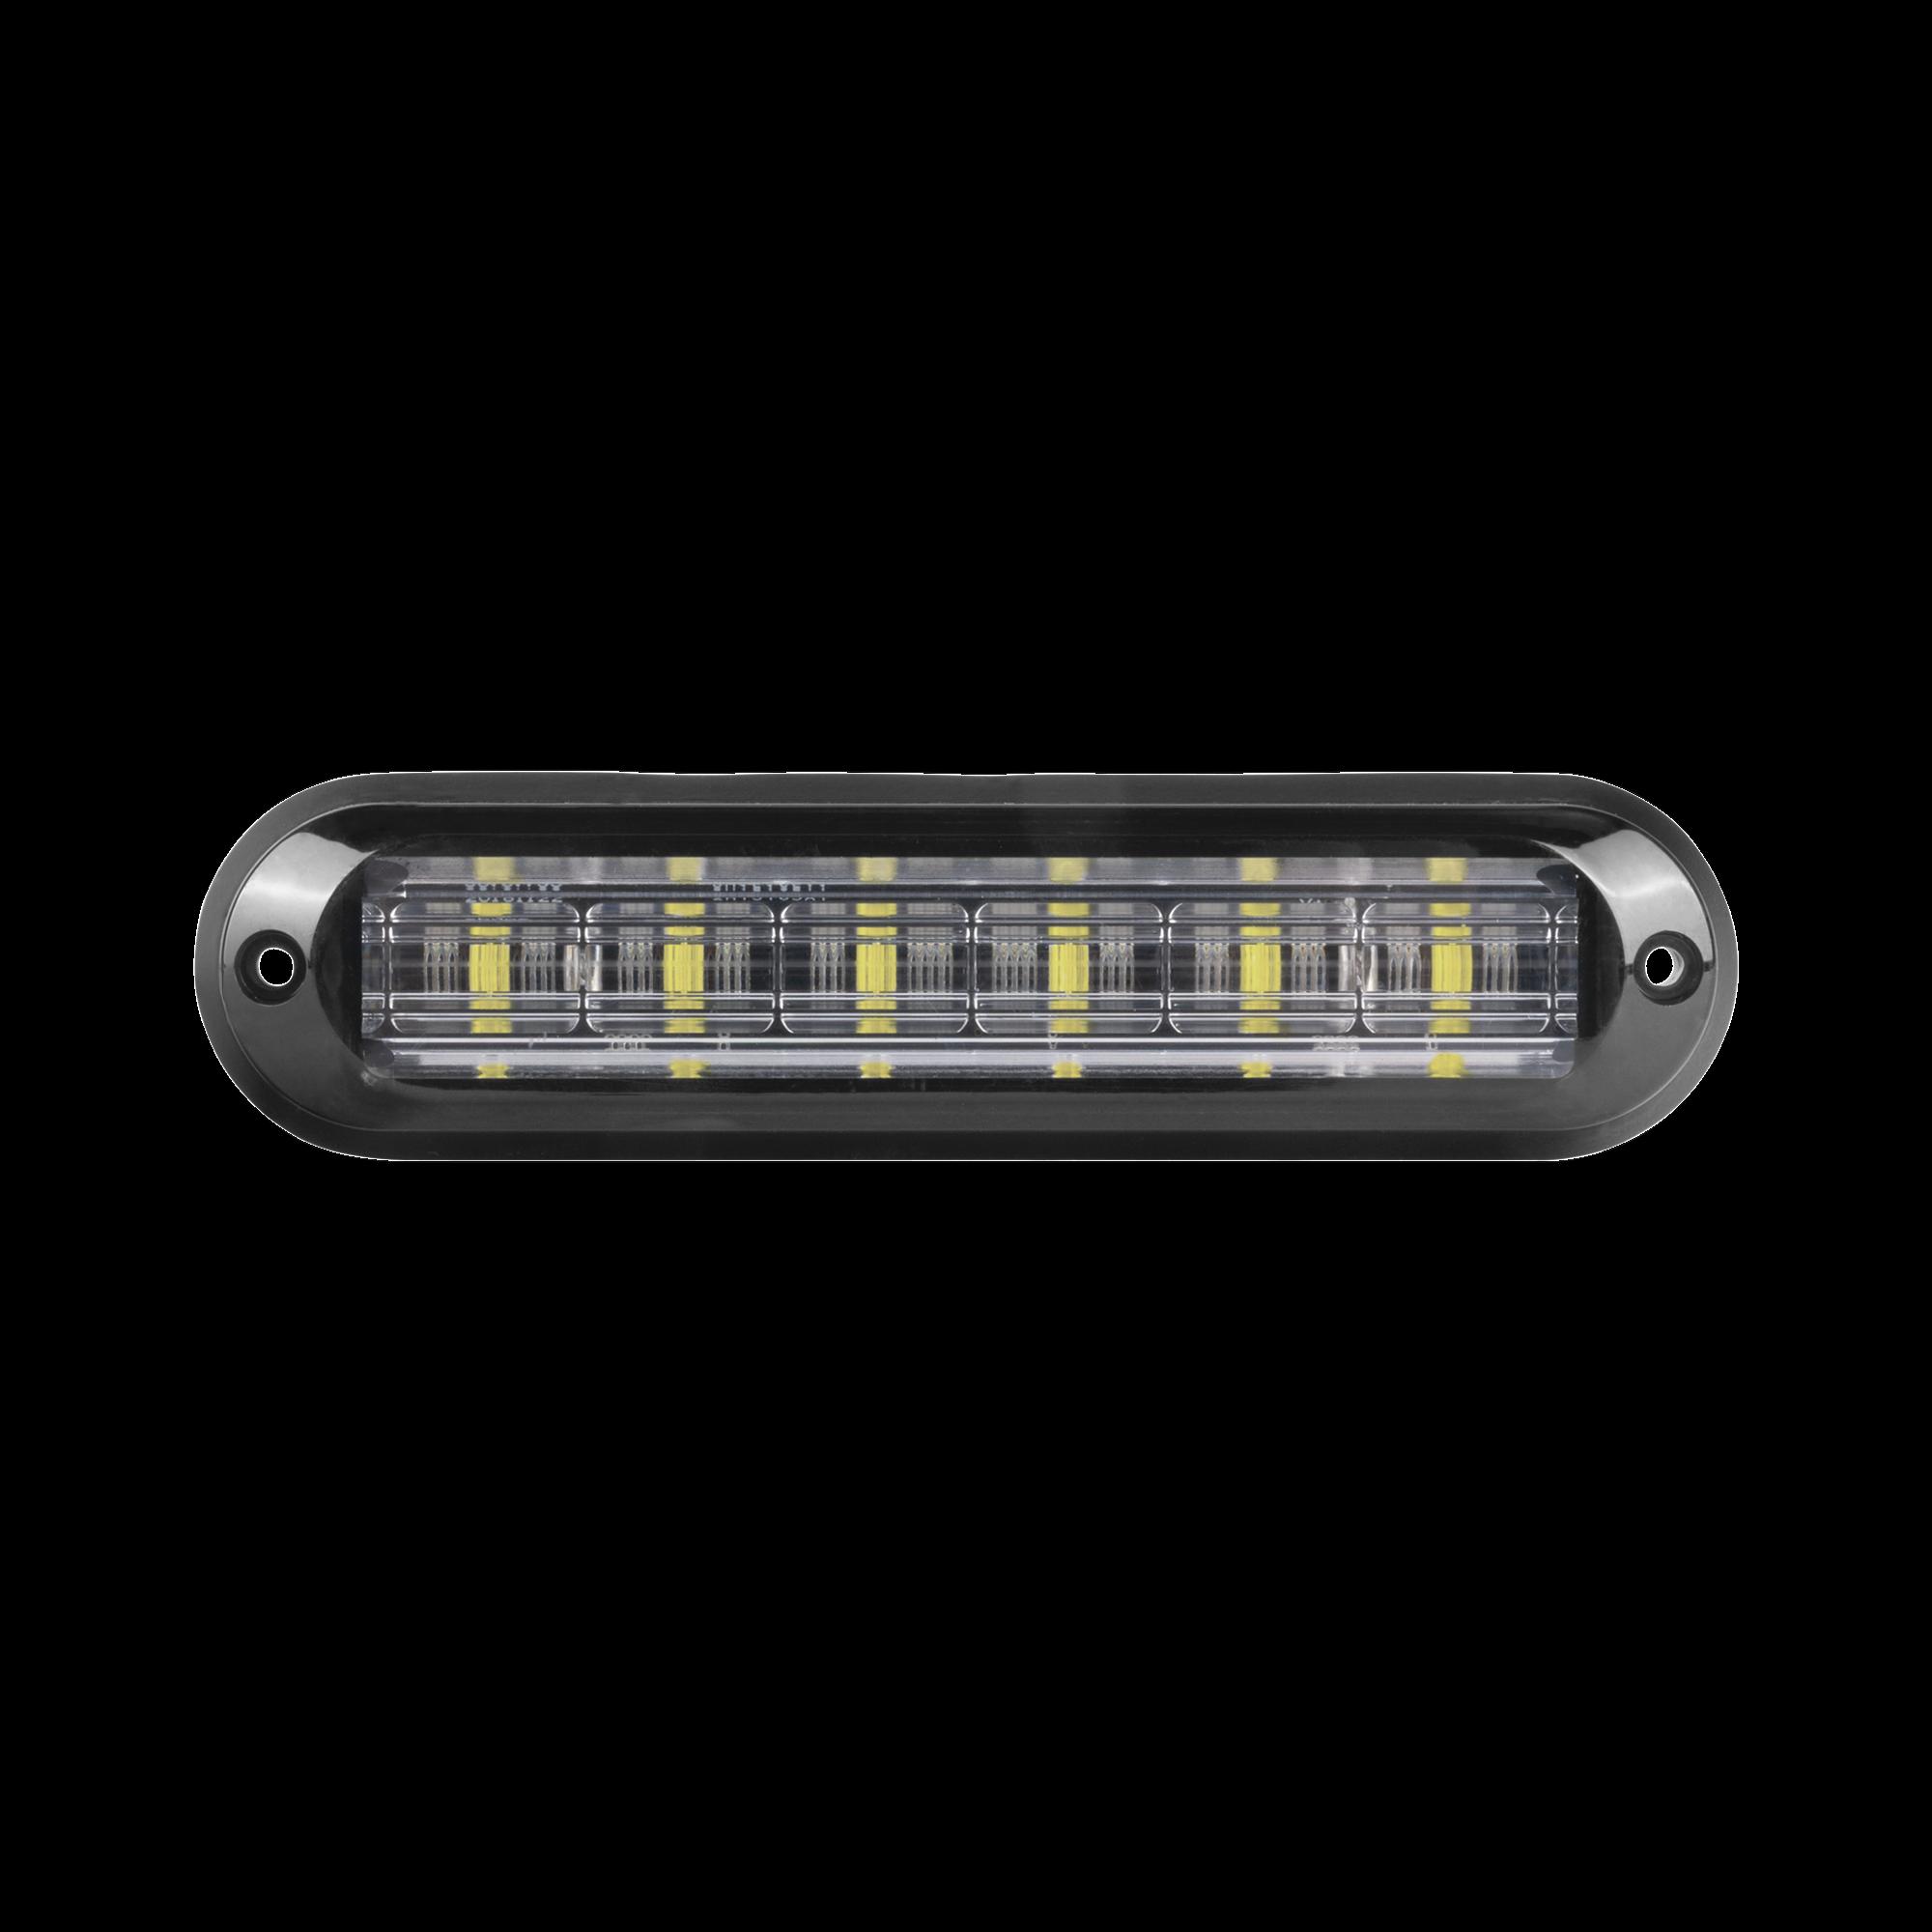 Luz auxiliar con 6 LED color ambar